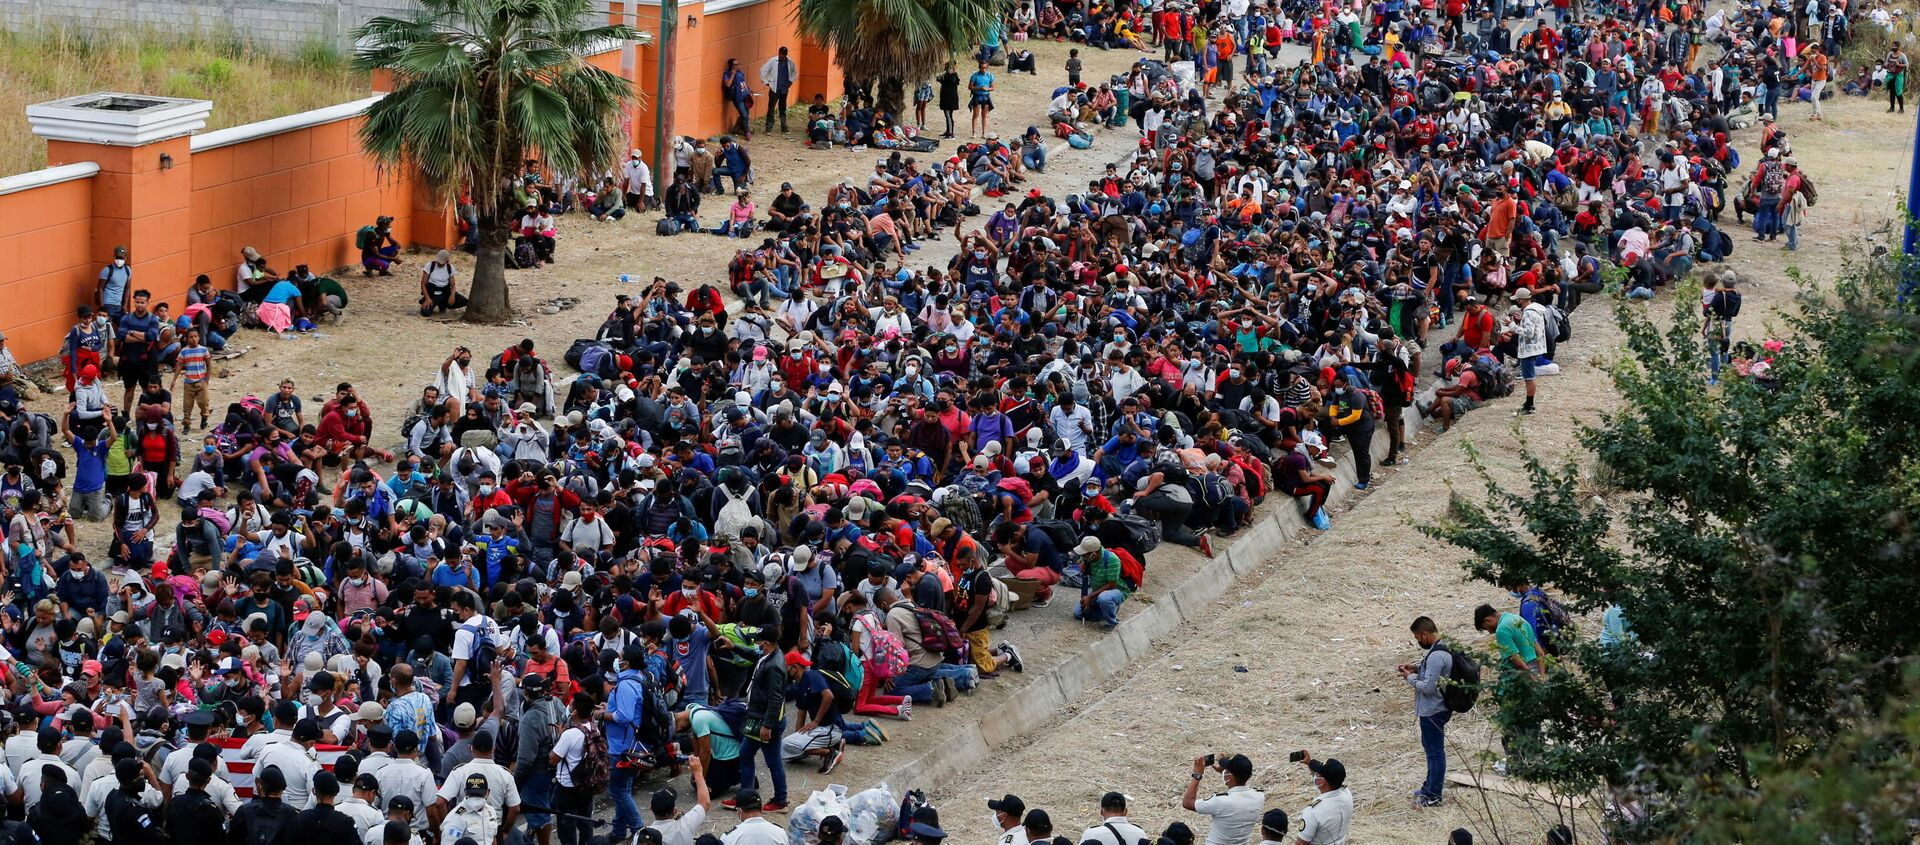 Caravana de migrantes en Guatemala - Sputnik Mundo, 1920, 06.02.2021